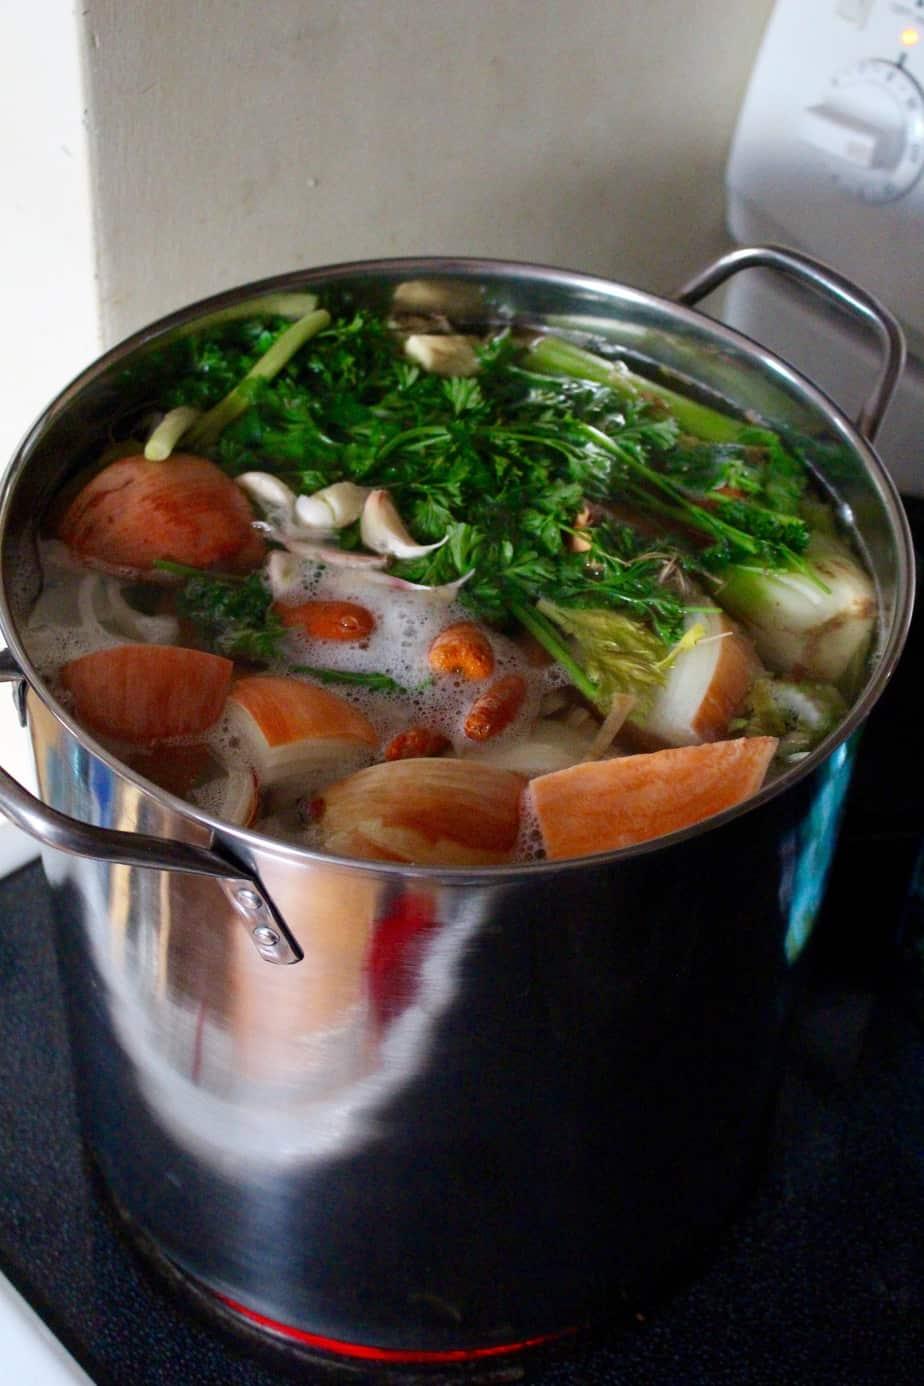 Homemade Nutrient Dense Veggie Broth | Frugal Nutrition